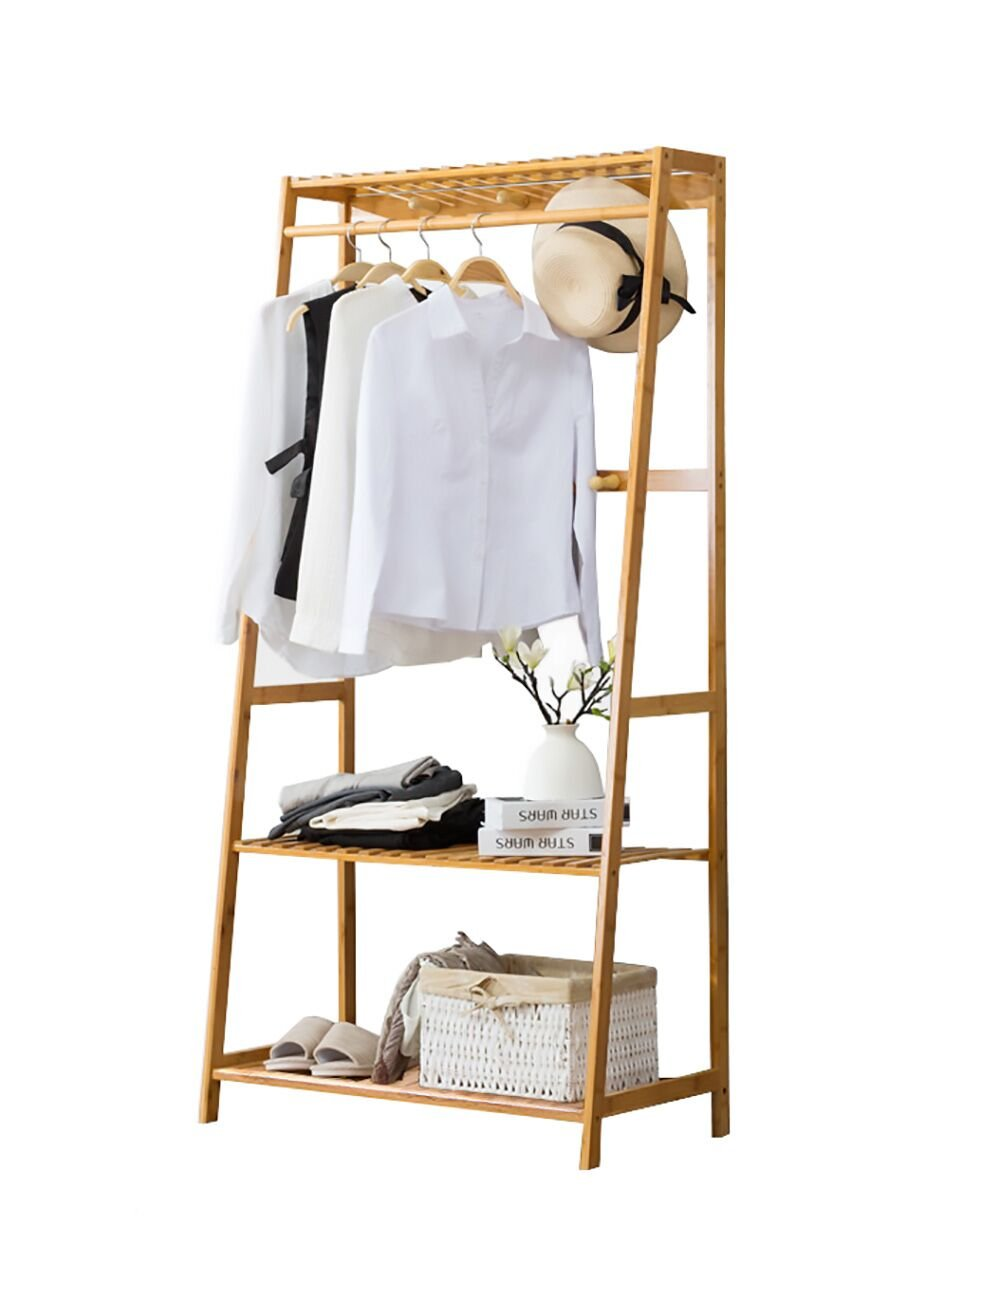 Ufine Garment Rack Bamboo Wood Entryway Clothes Drying Rack Plant Ladder 3 Tier Shoe Storage Shelves Organizer 6 Coat Hooks 1 Clothing Hanger Heavy Duty Wardrobe Closet in Livingroom Bedroom Hallway